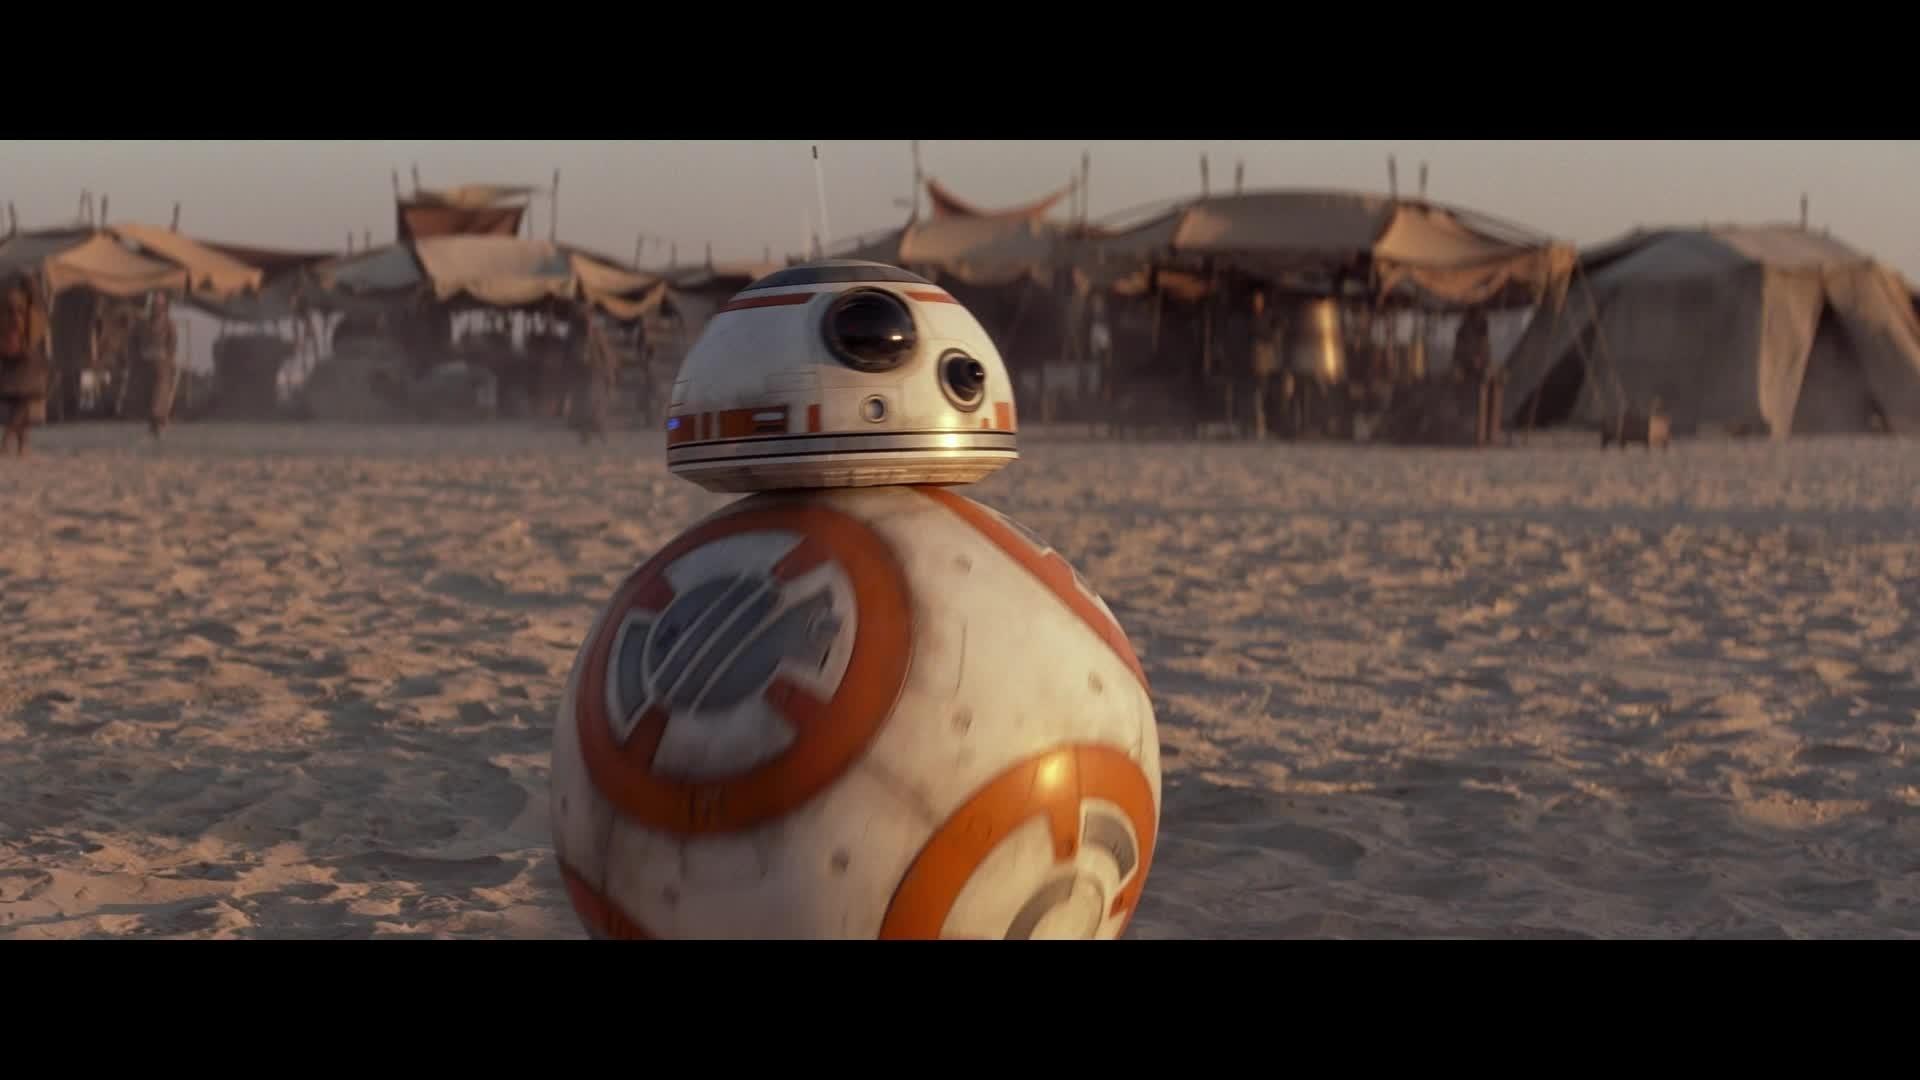 Star Wars The Force Awakens: Designing BB8